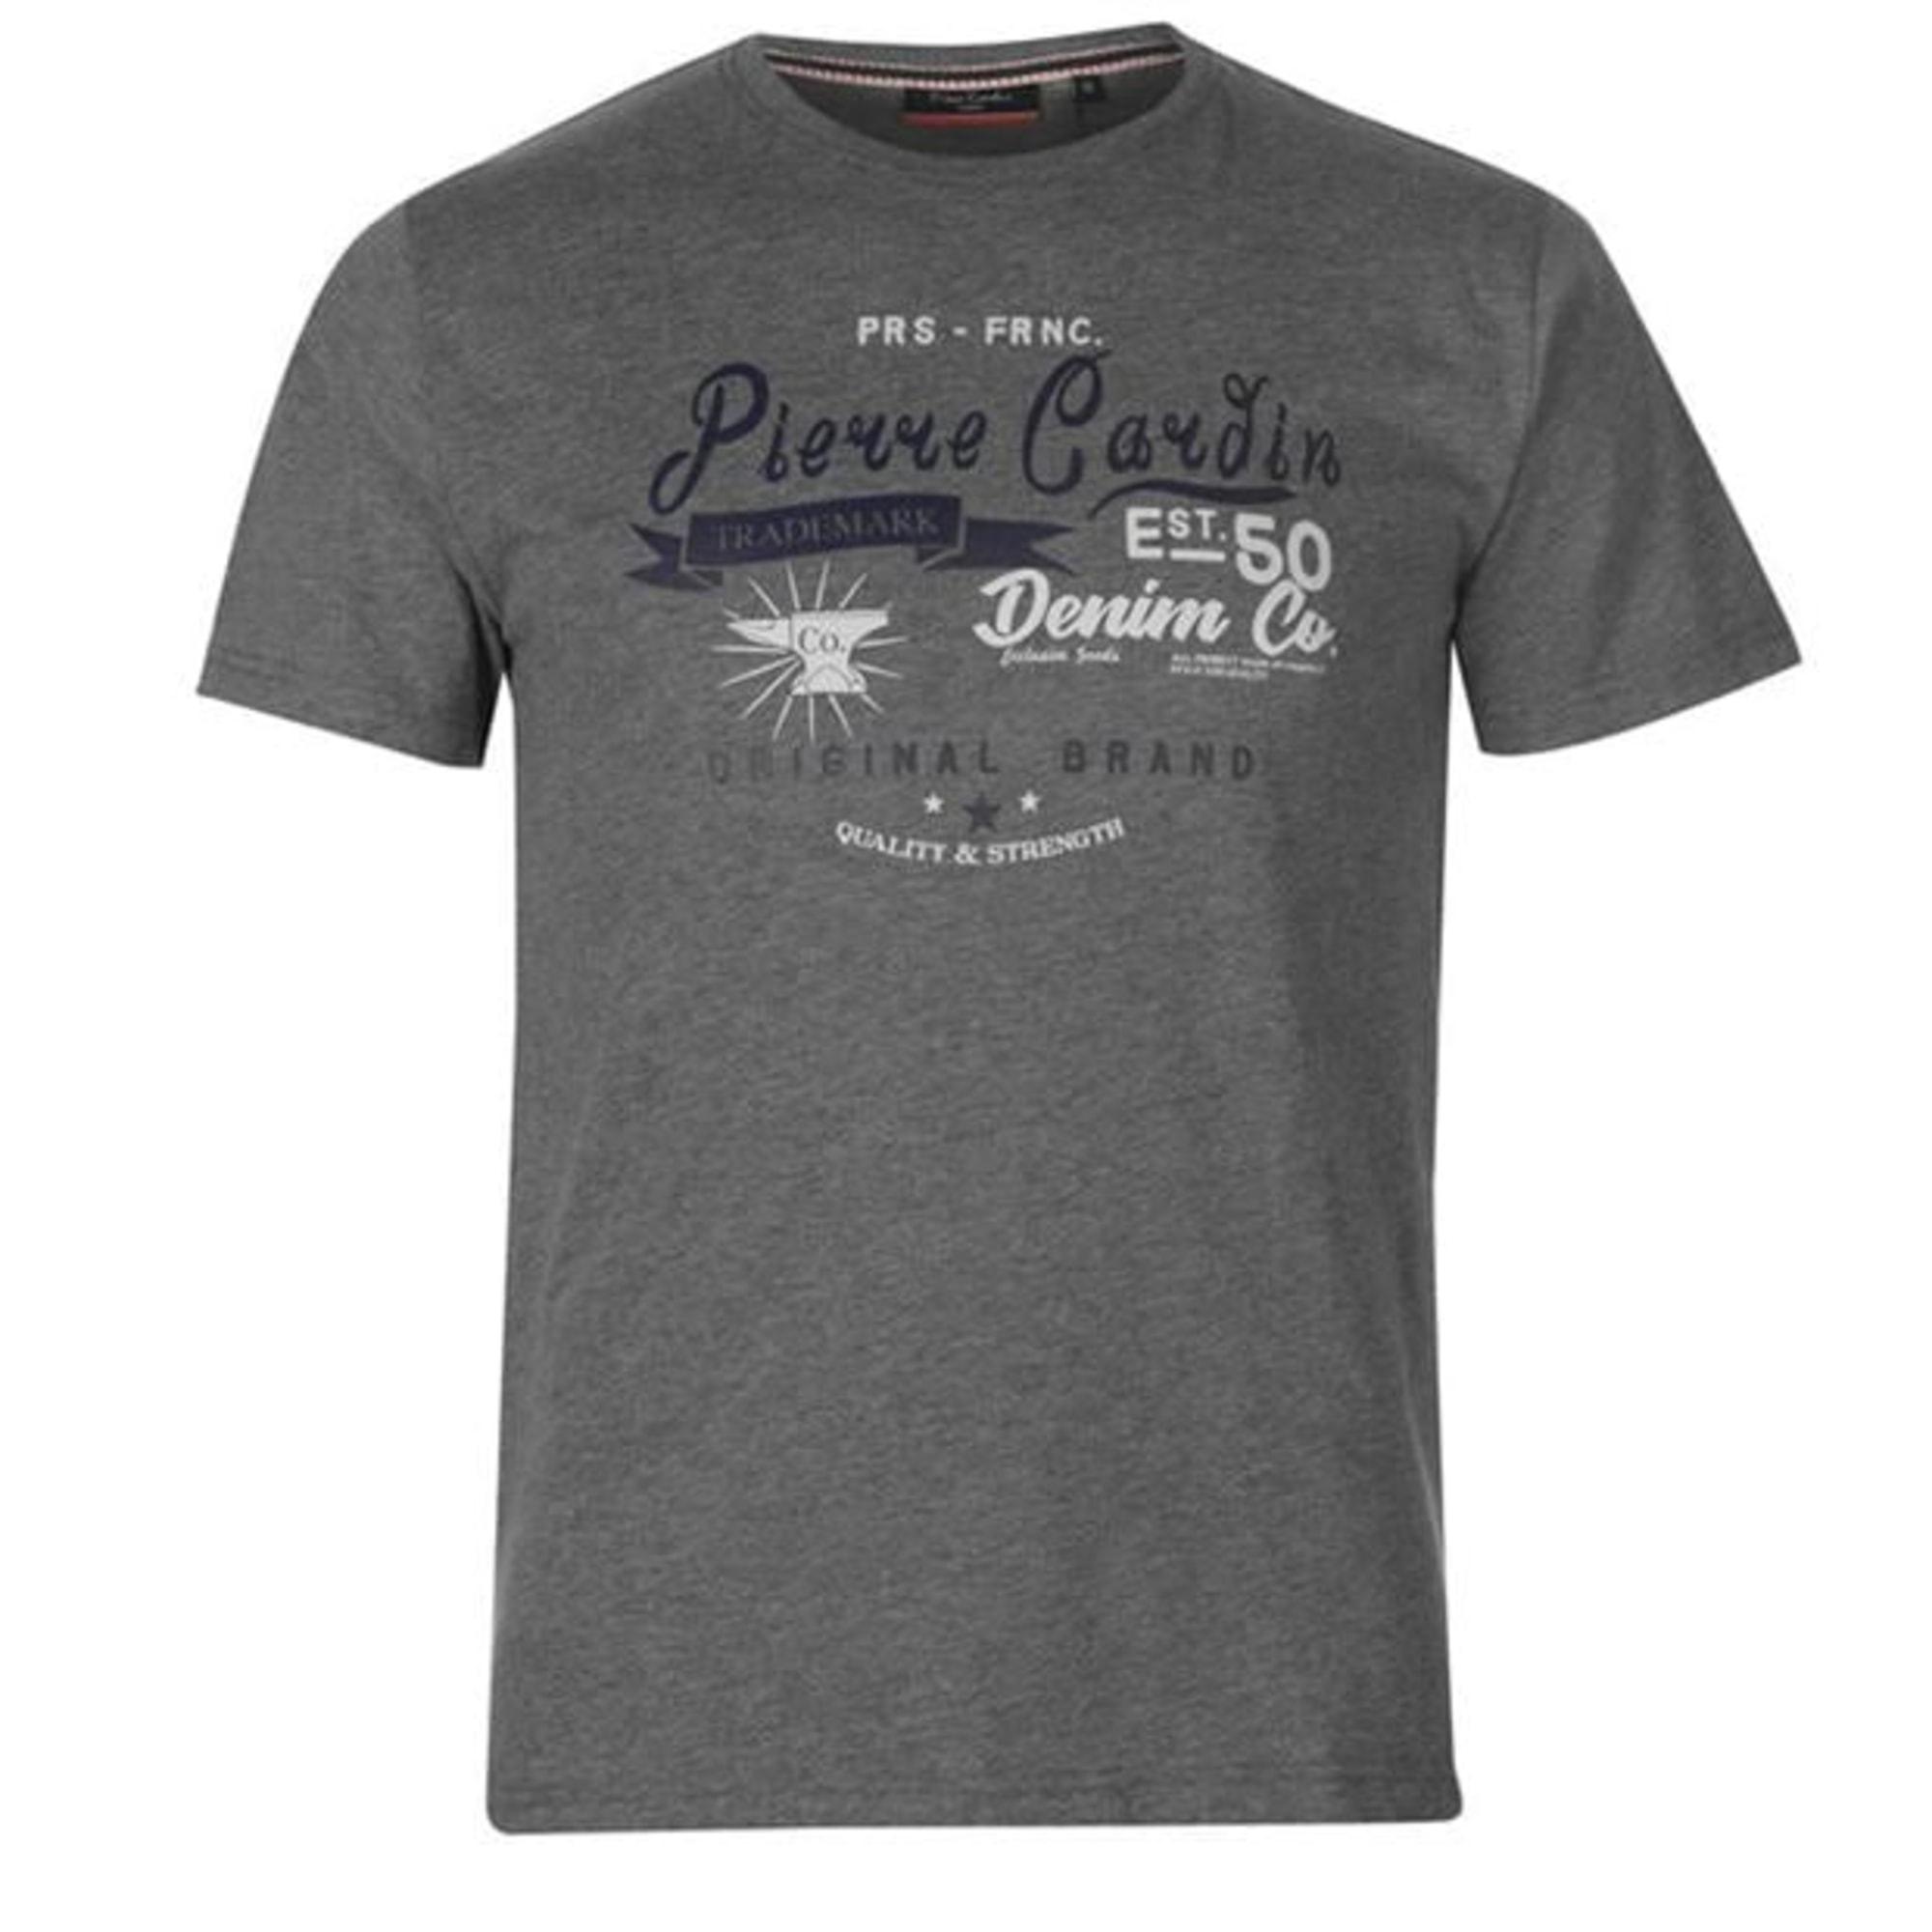 Tee-shirt PIERRE CARDIN Gris, anthracite